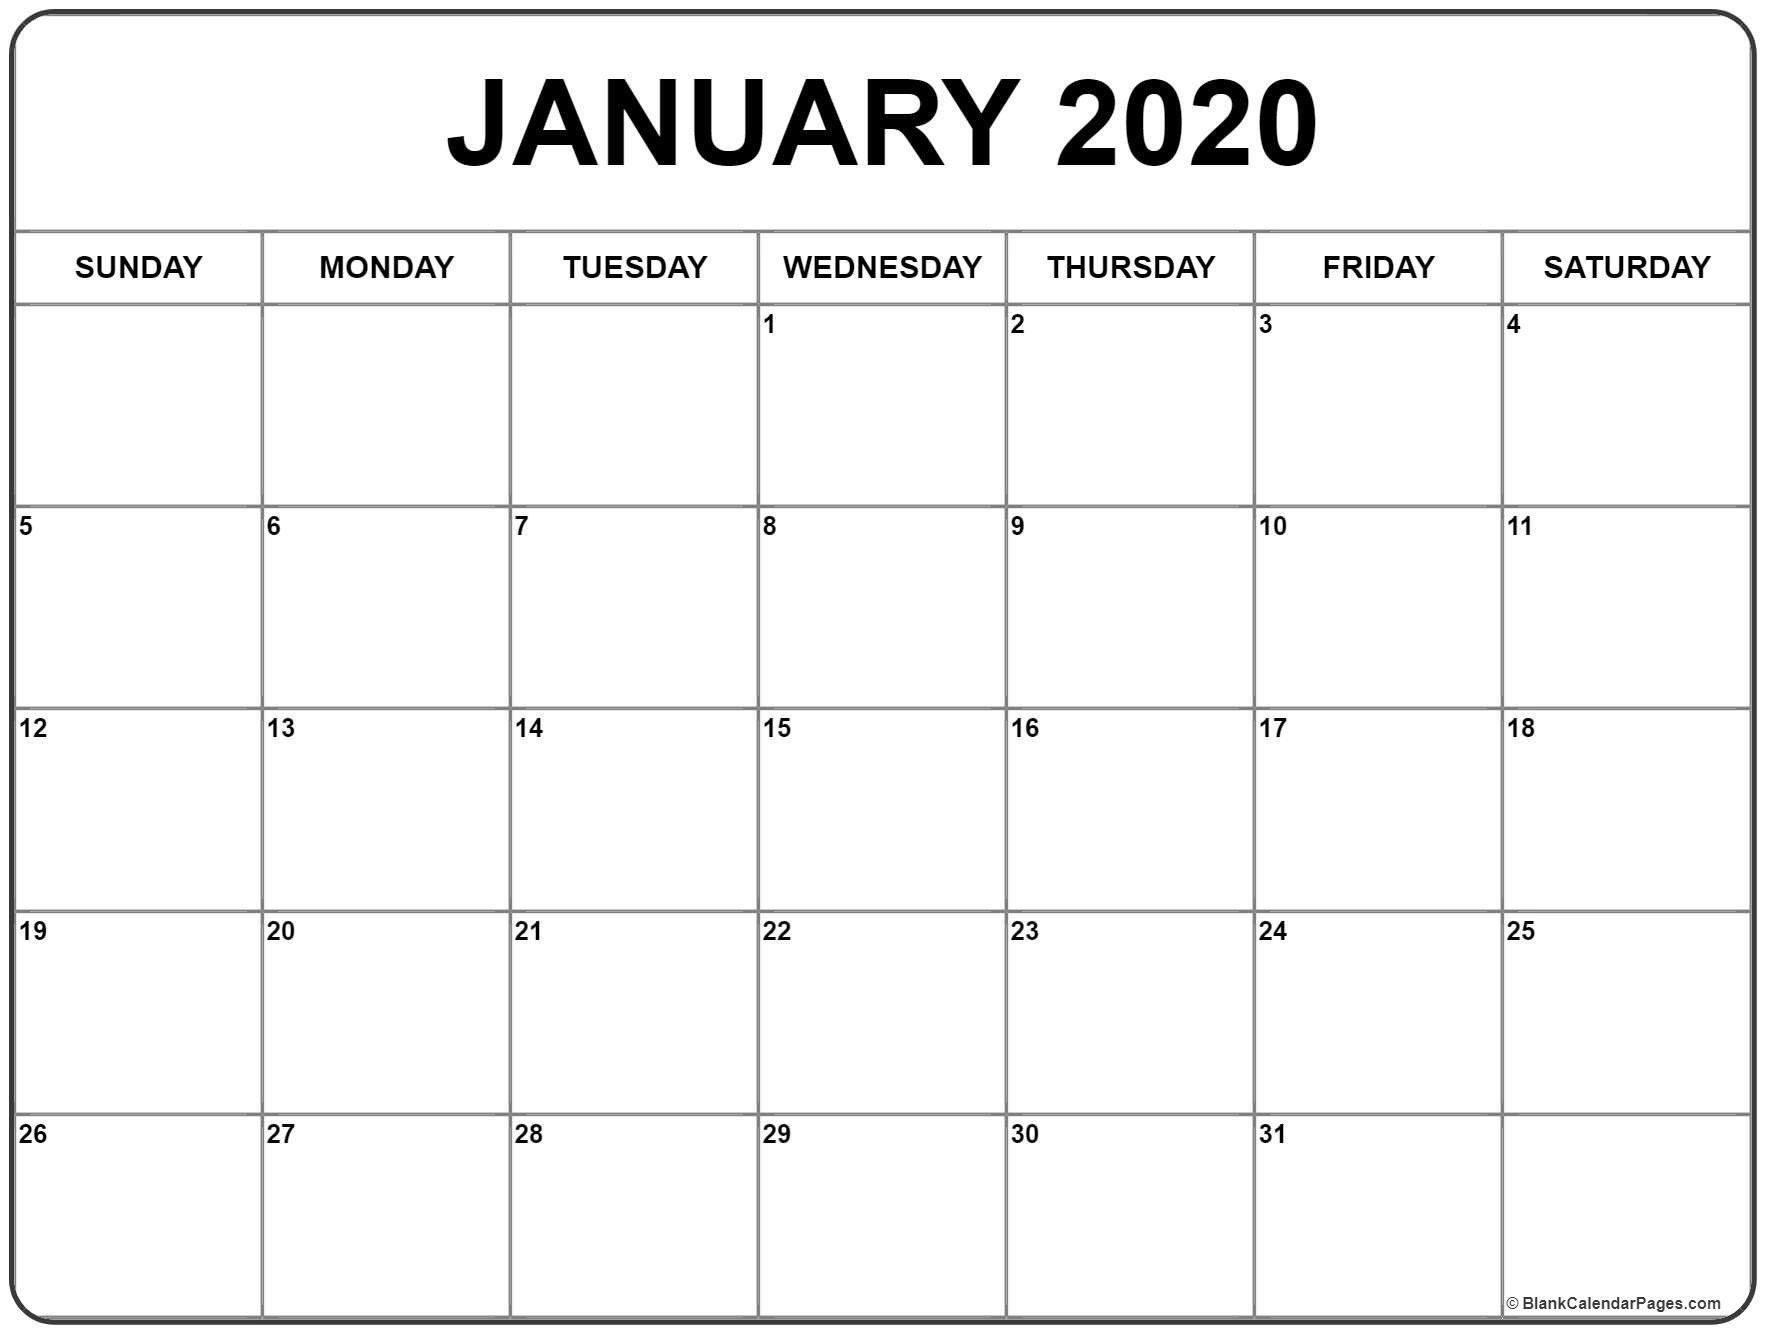 January 2020 Calendar 56 Templates Of 2020 Printable January 2020 Blank Printable Monthly Template